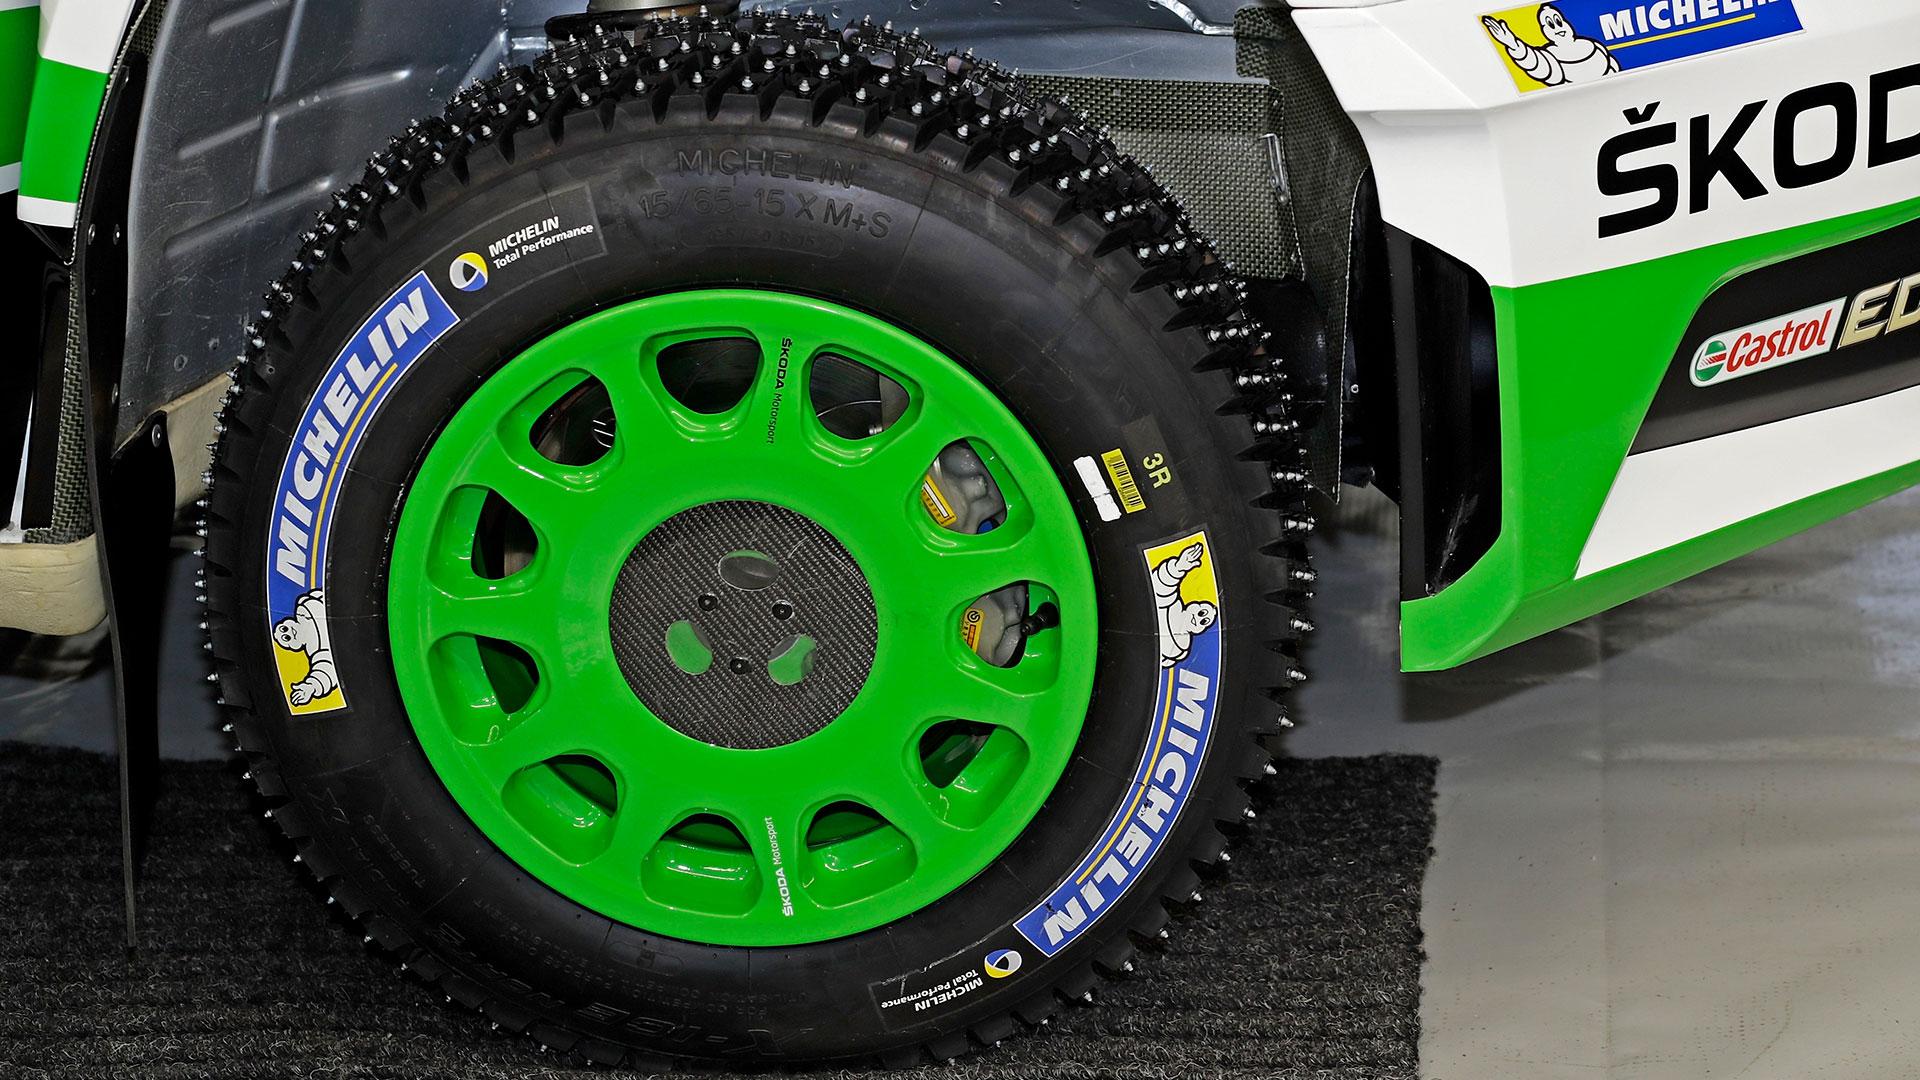 Zimní pneumatiky s hroty, ŠKODA FABIA R5